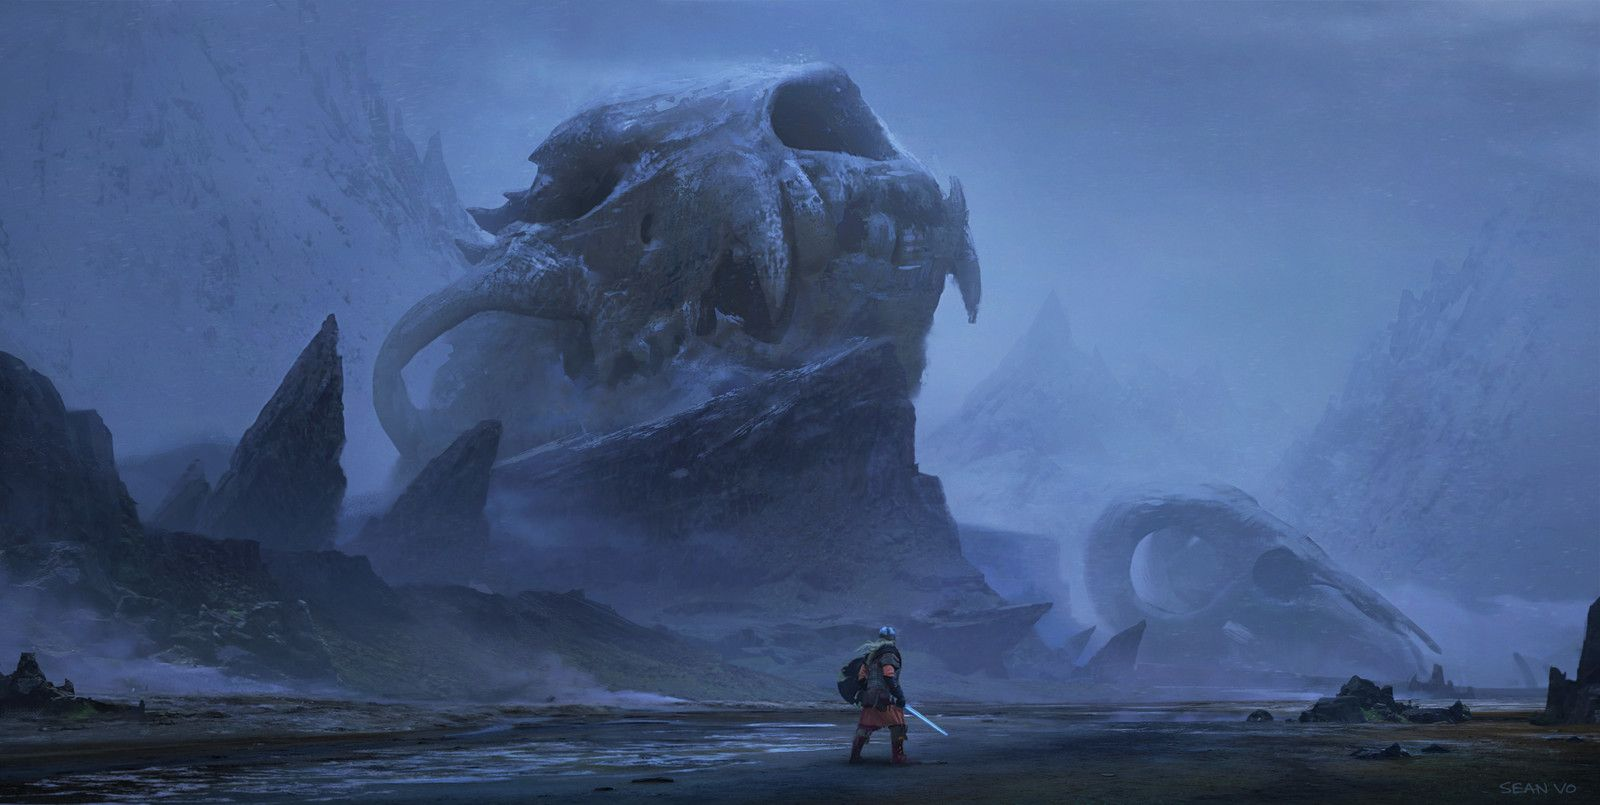 Viking Quest, Sean Vo on ArtStation at https://www.artstation.com/artwork/OxZrb